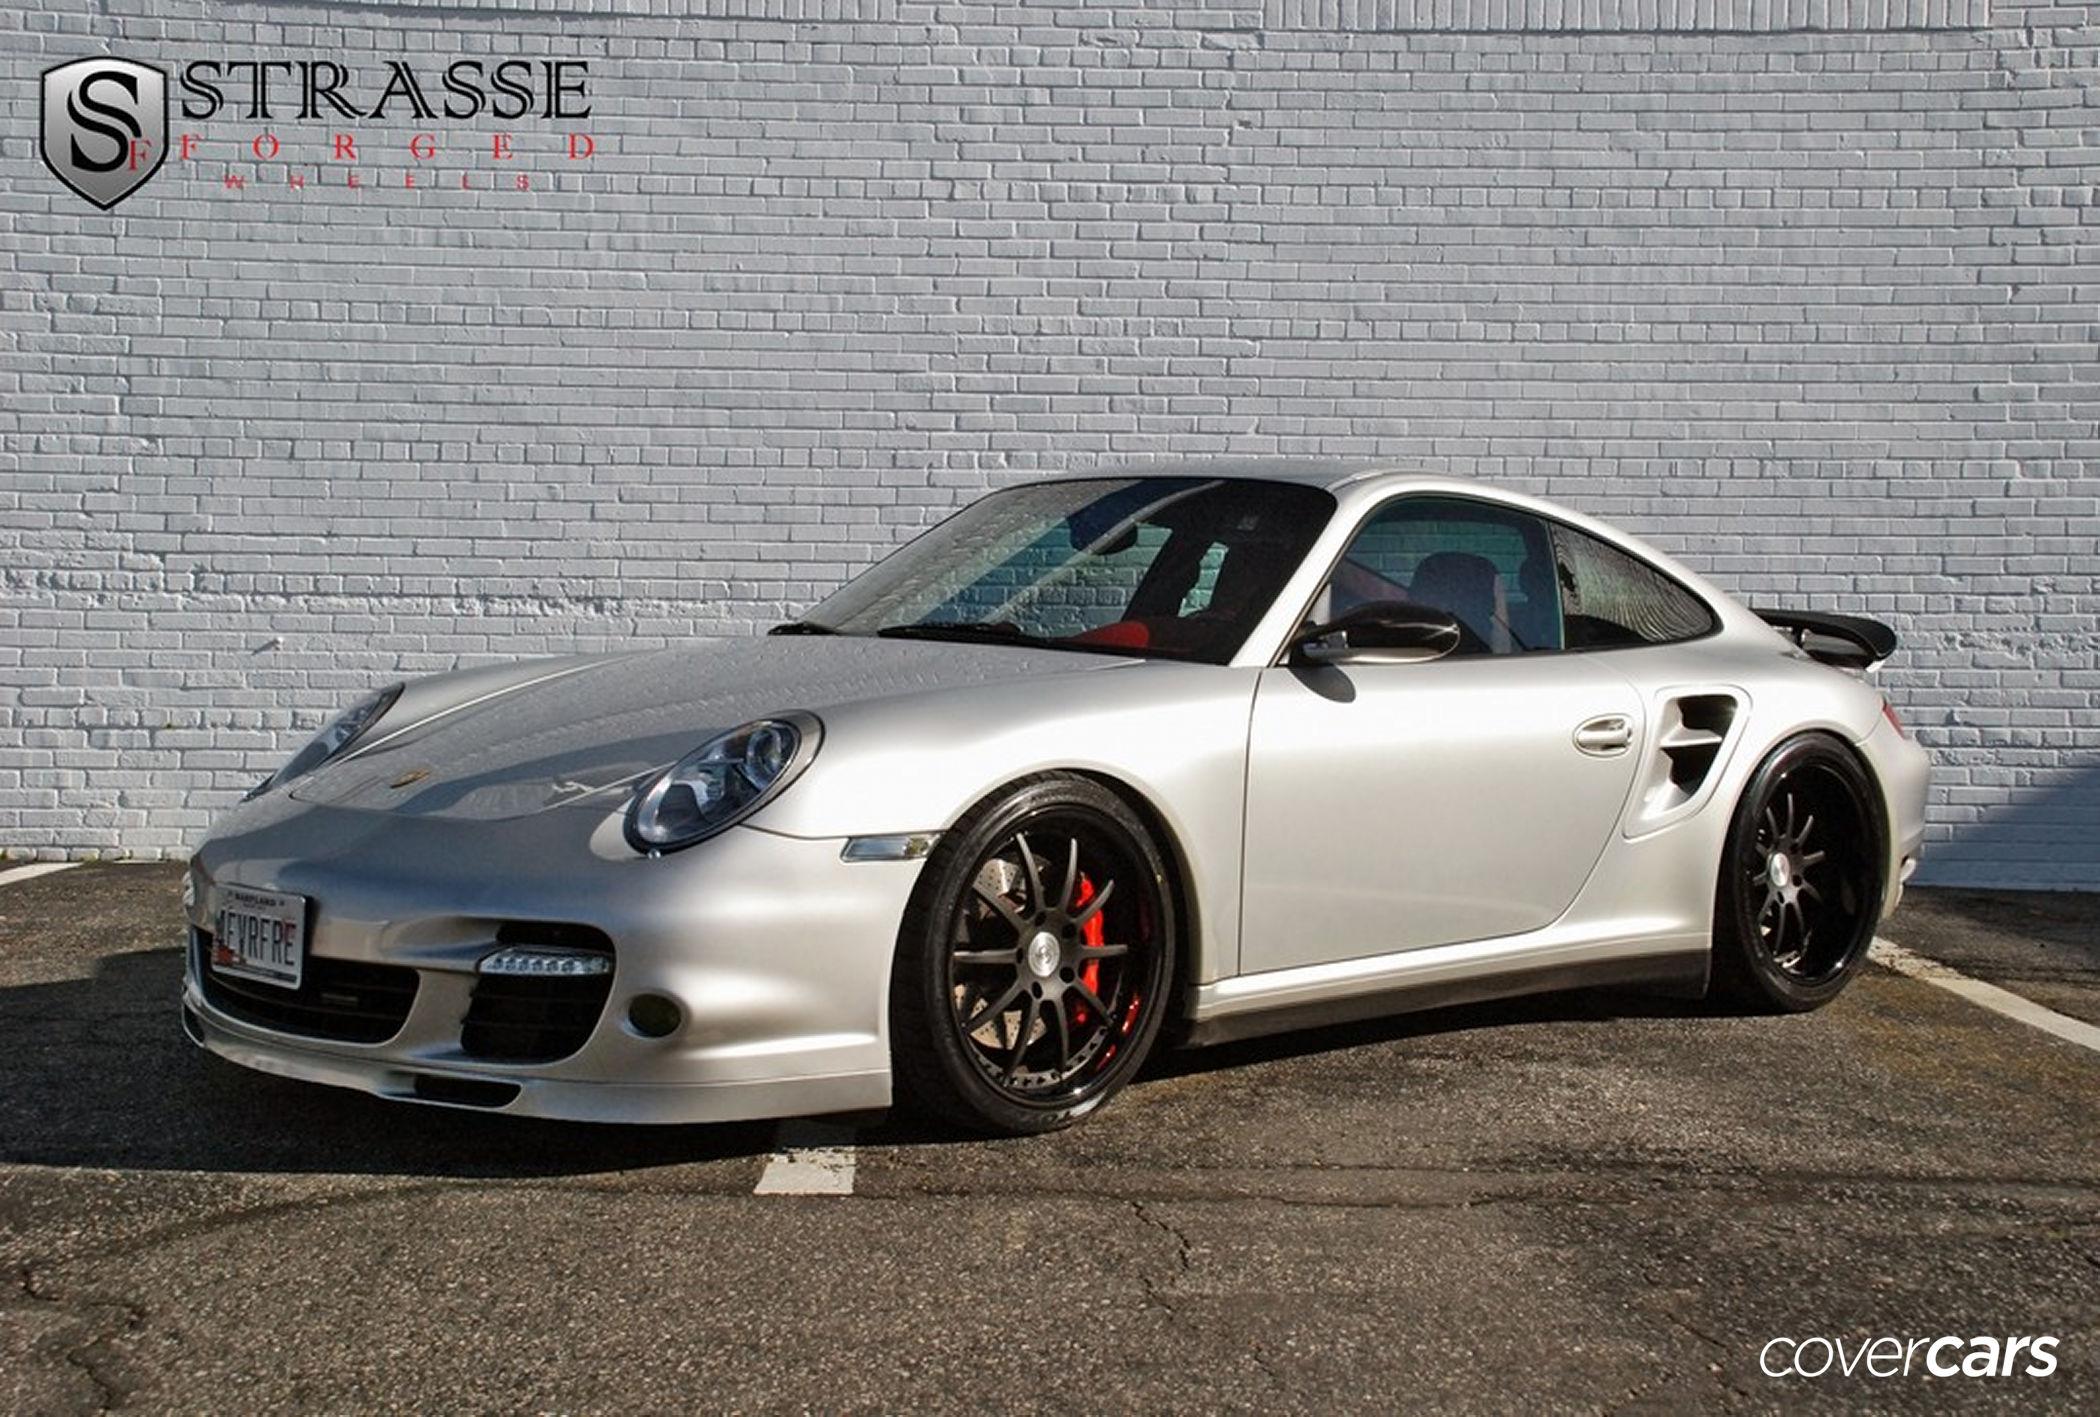 2011 silver Porsche 911 Turbo wallpapers 2100x1417